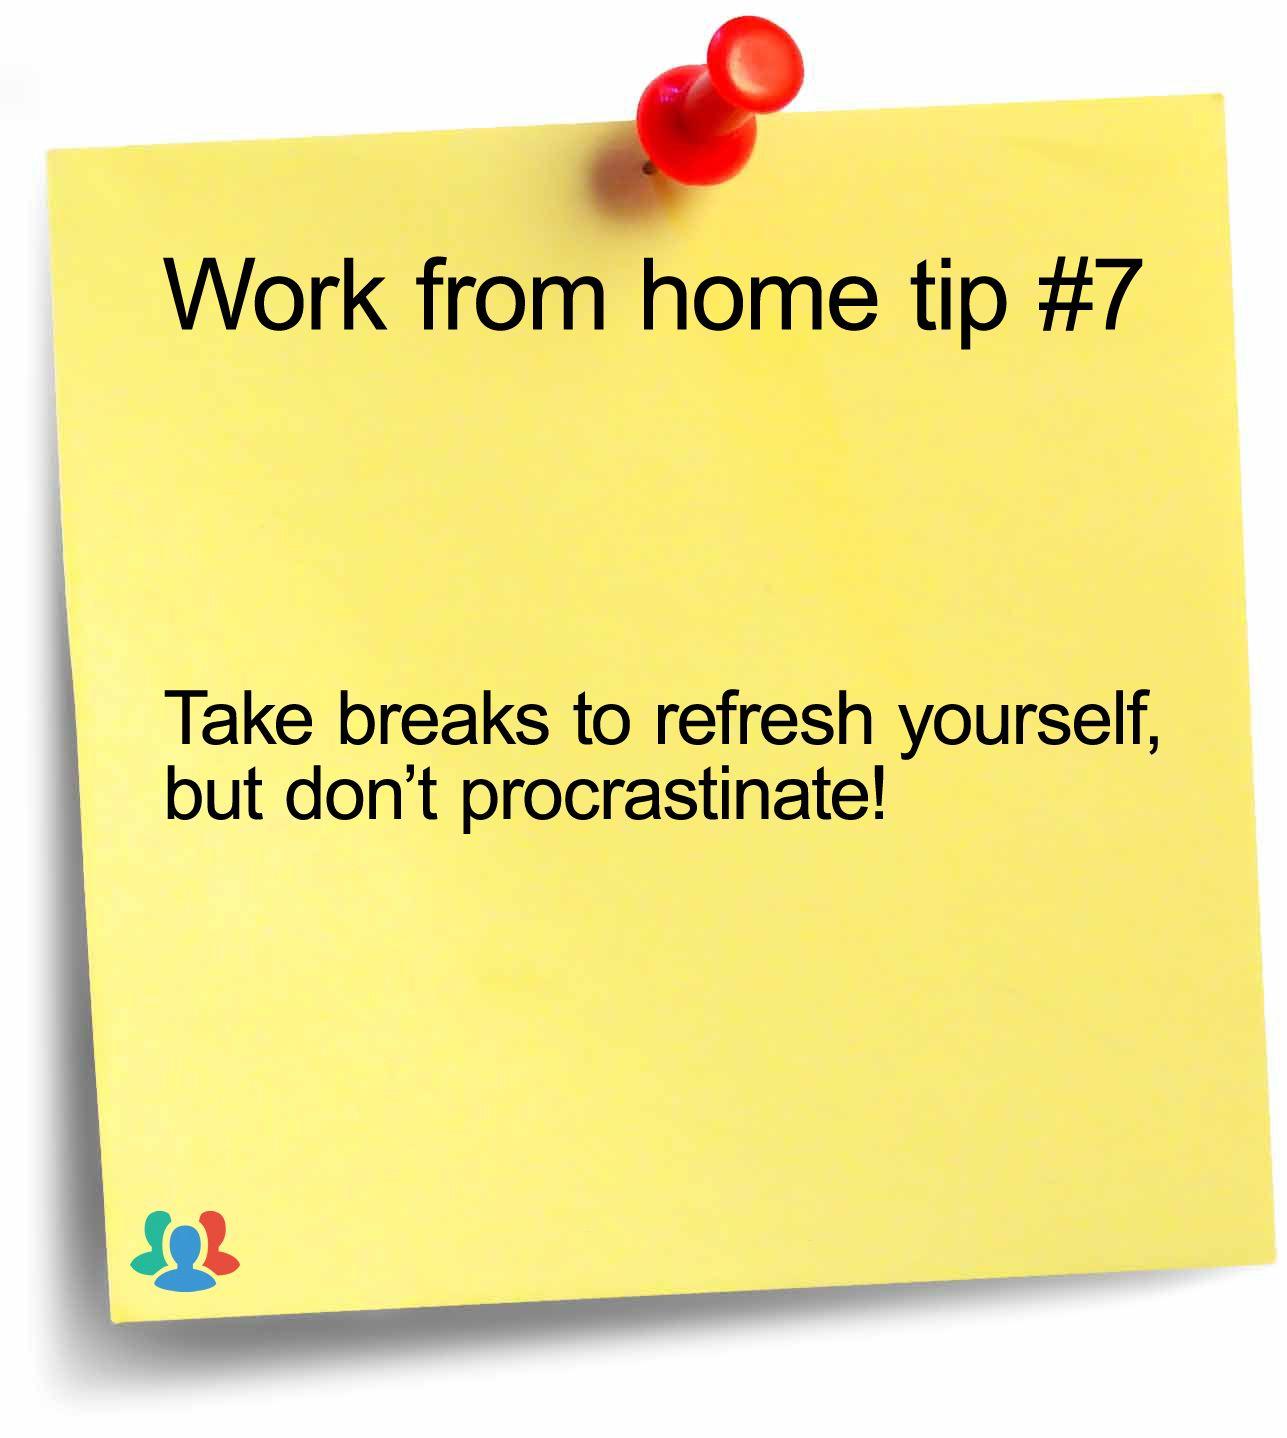 workfromhome sales freelance selfemployed tips